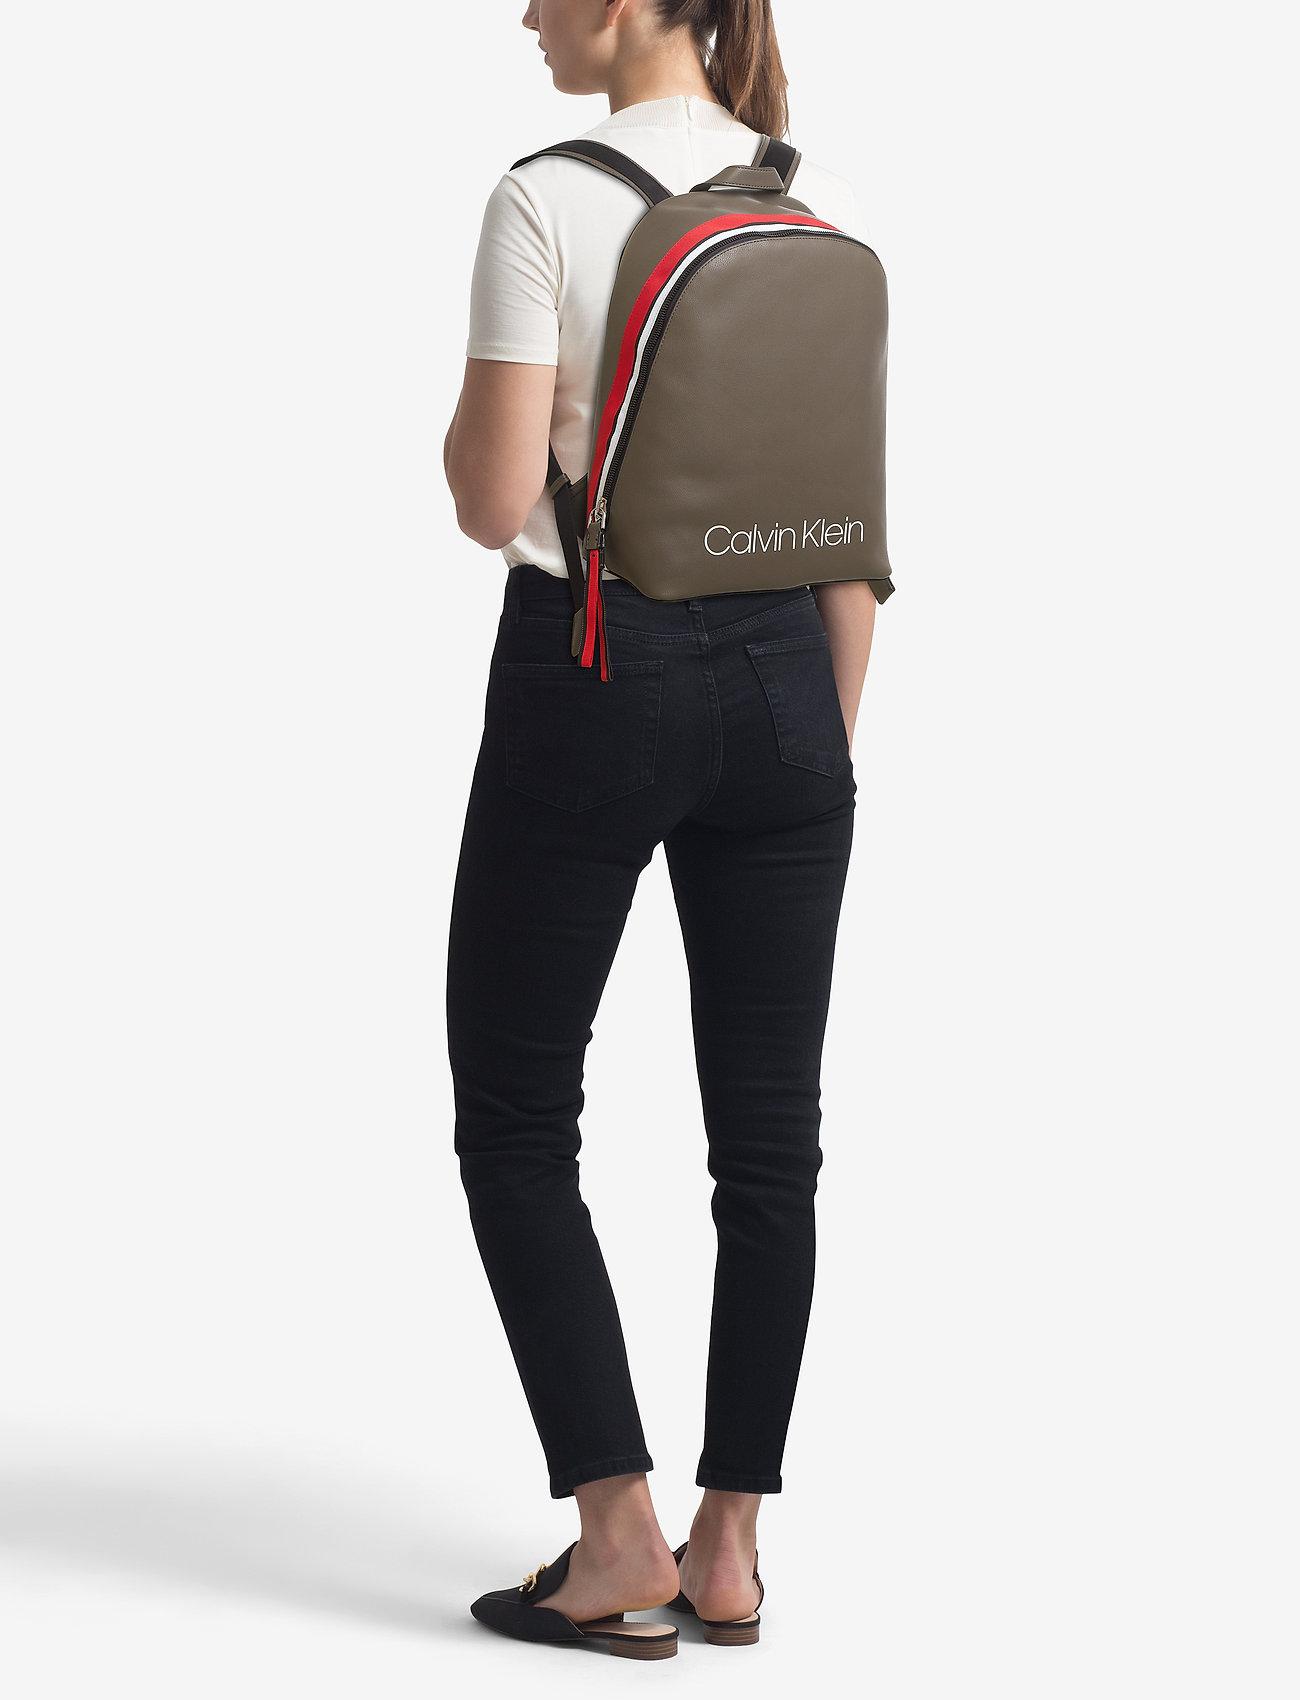 Calvin Klein COLLEGIC BACKPACK - ARMY FTGE